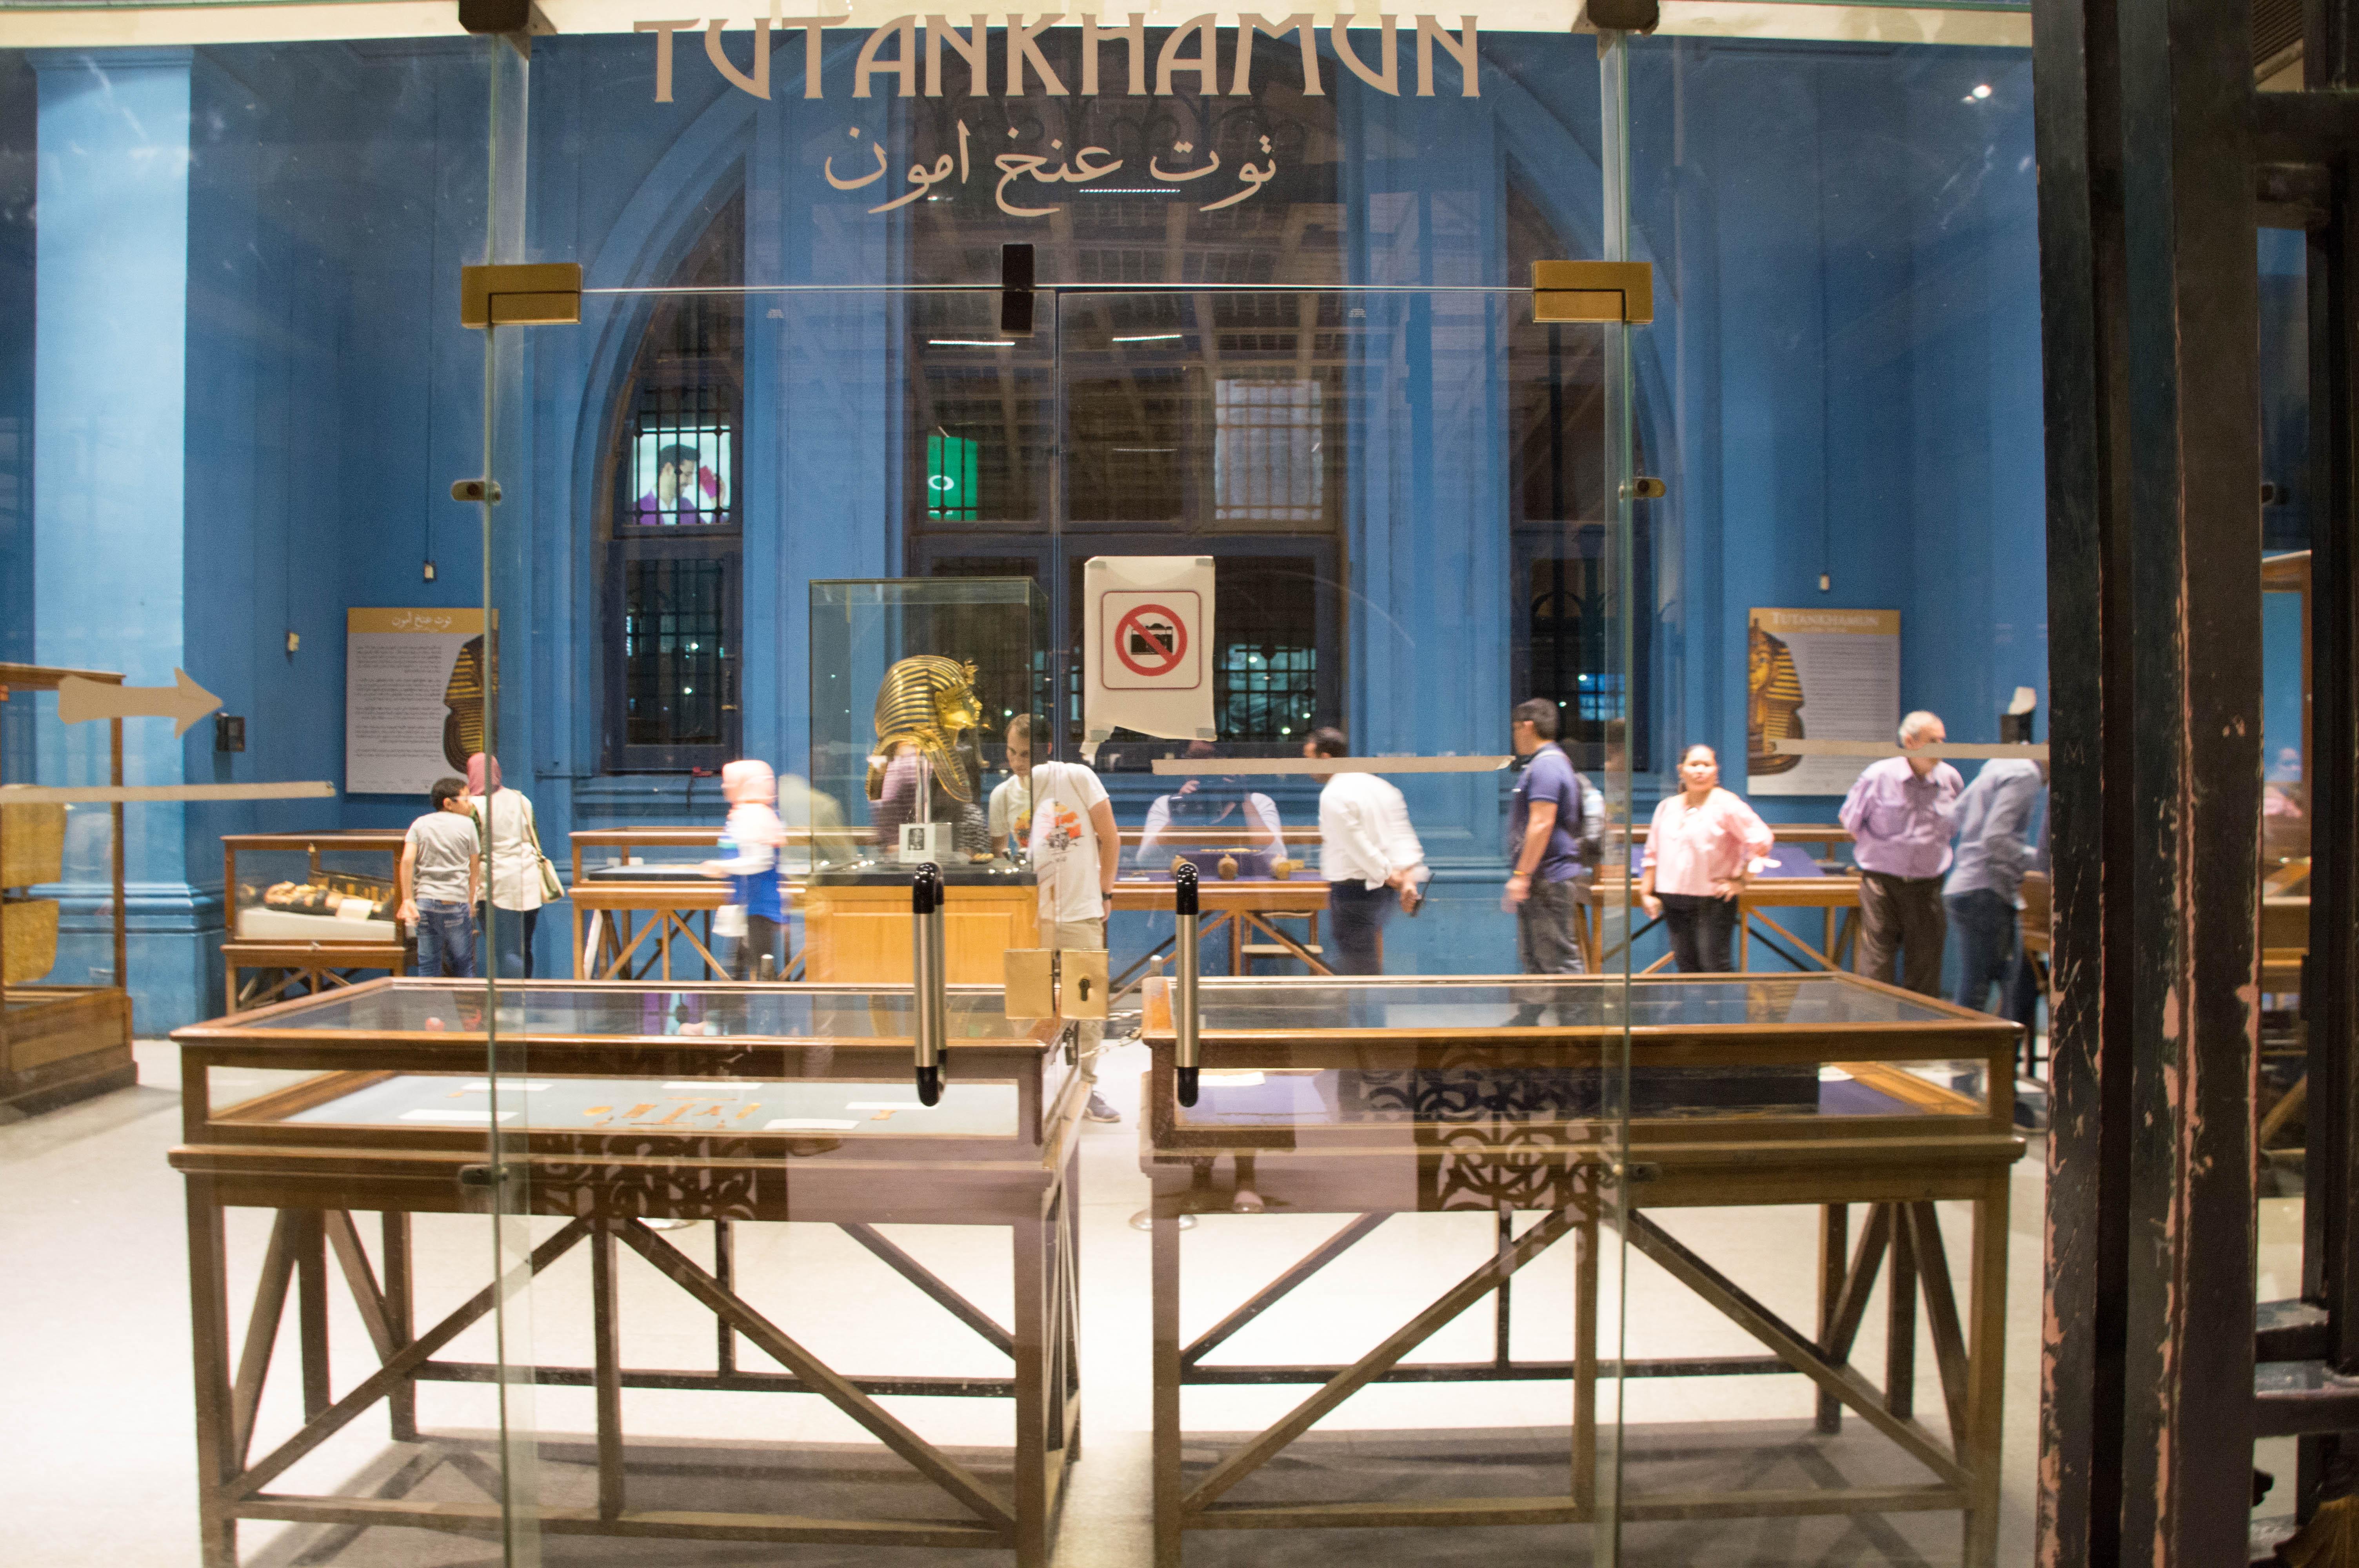 Tutankhamun Exhibit, Egypt Museum, Cairo